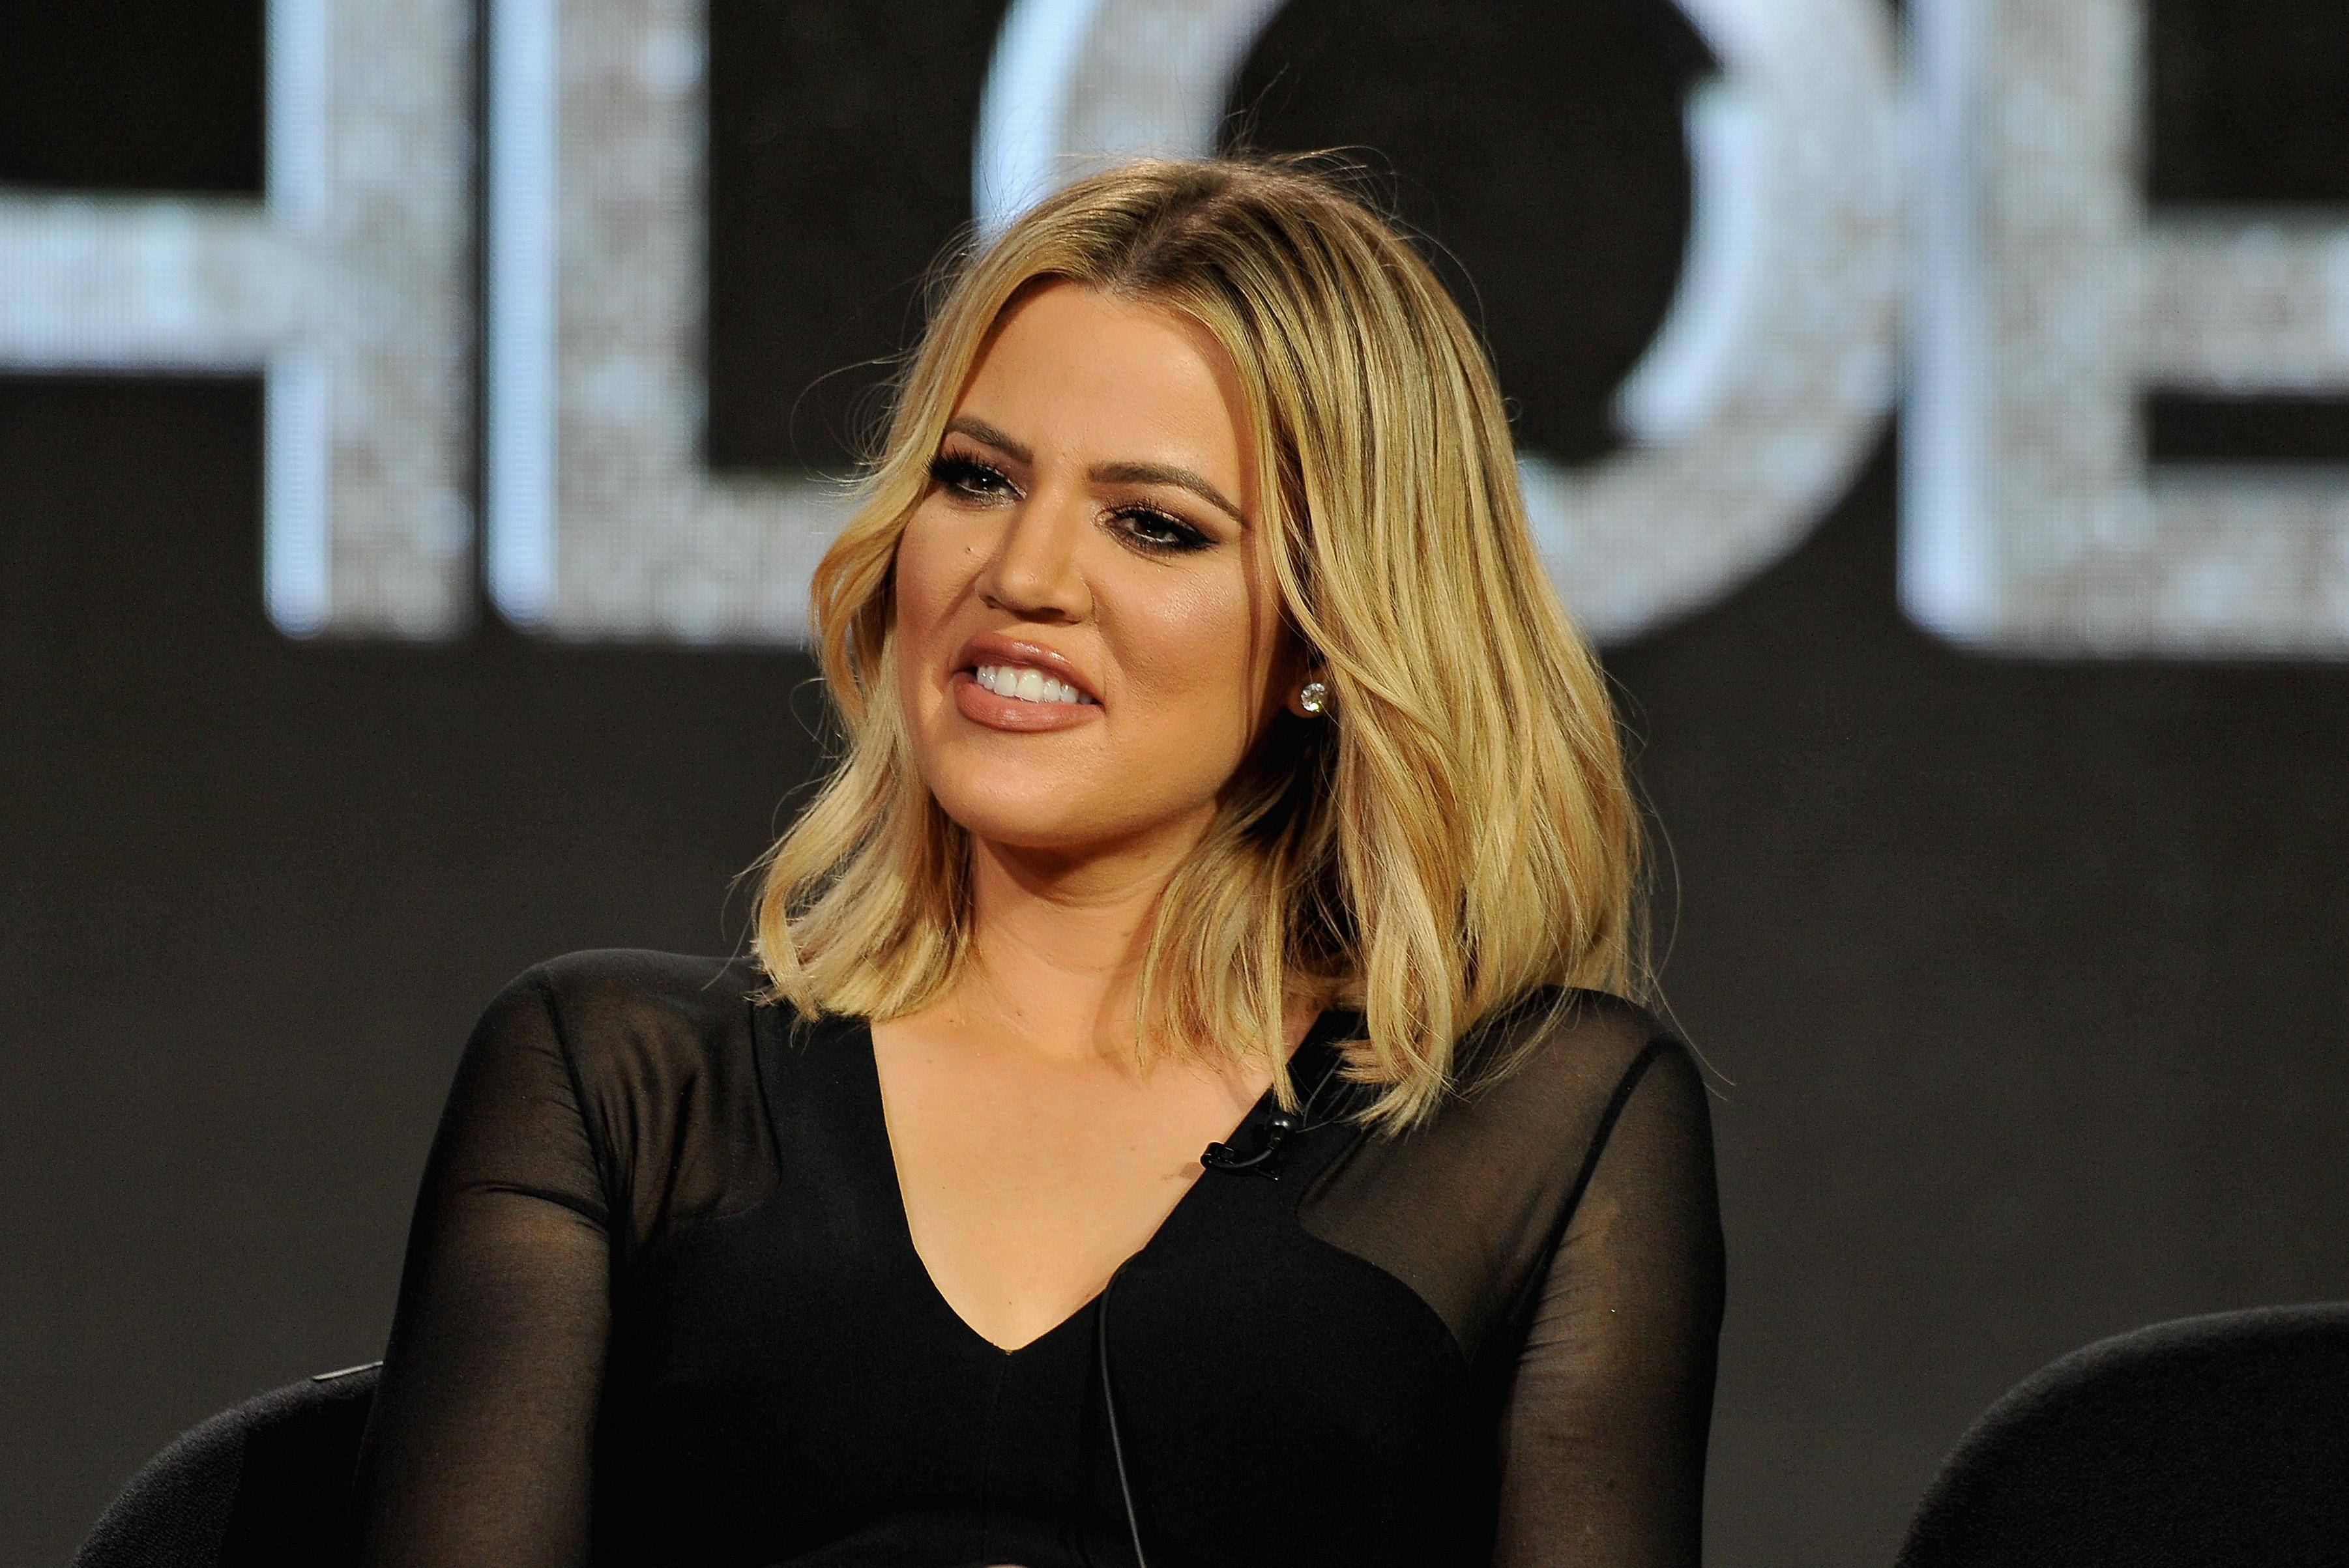 Khloe Kardashian hit back at fans for being 'complaining motherf******' on Snapchat